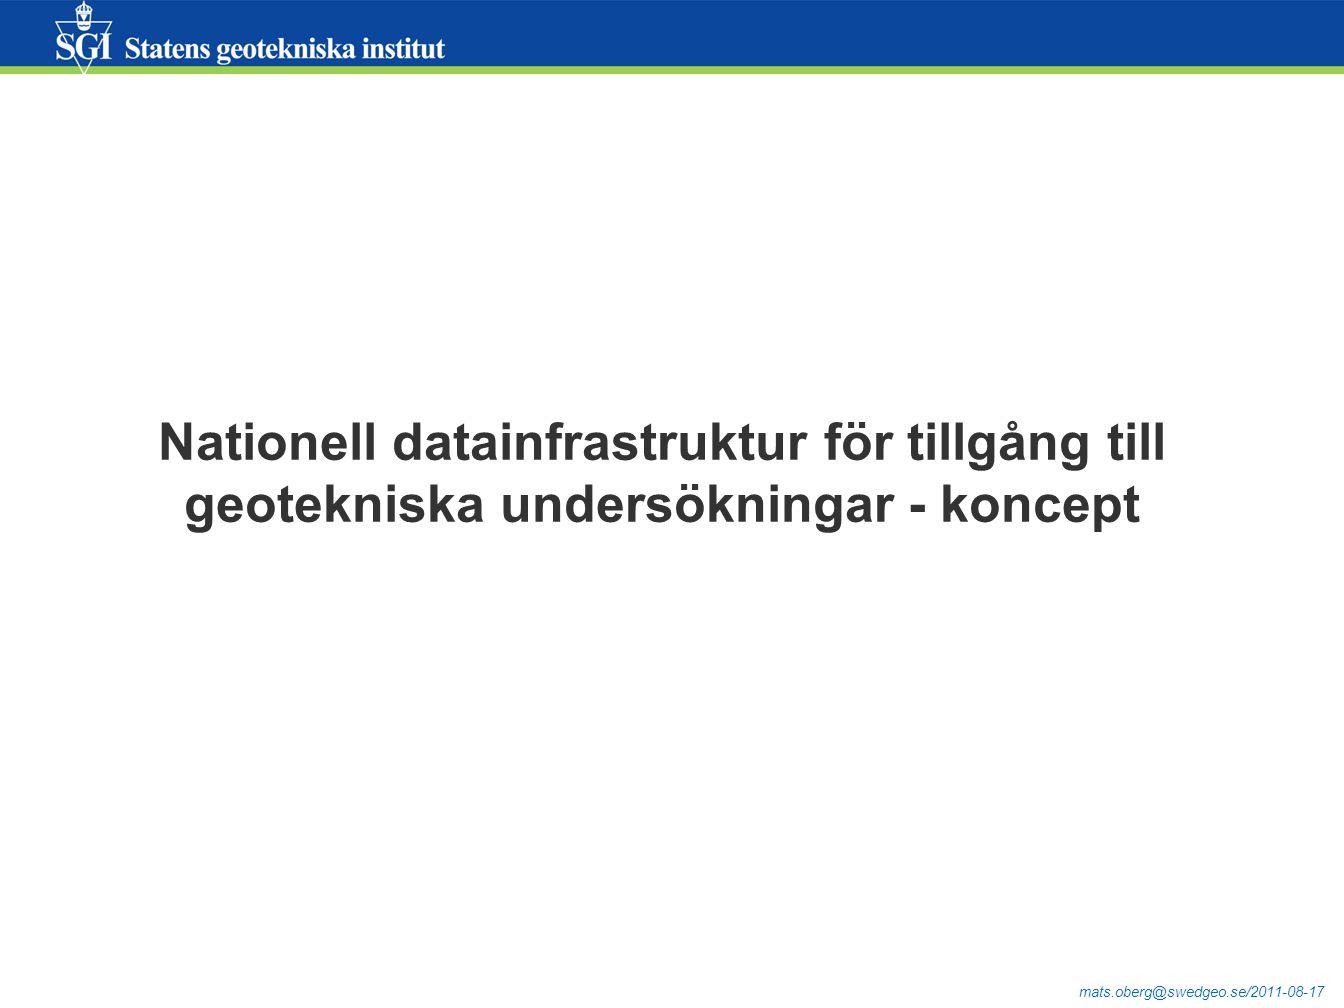 mats.oberg@swedgeo.se/2011-08-17